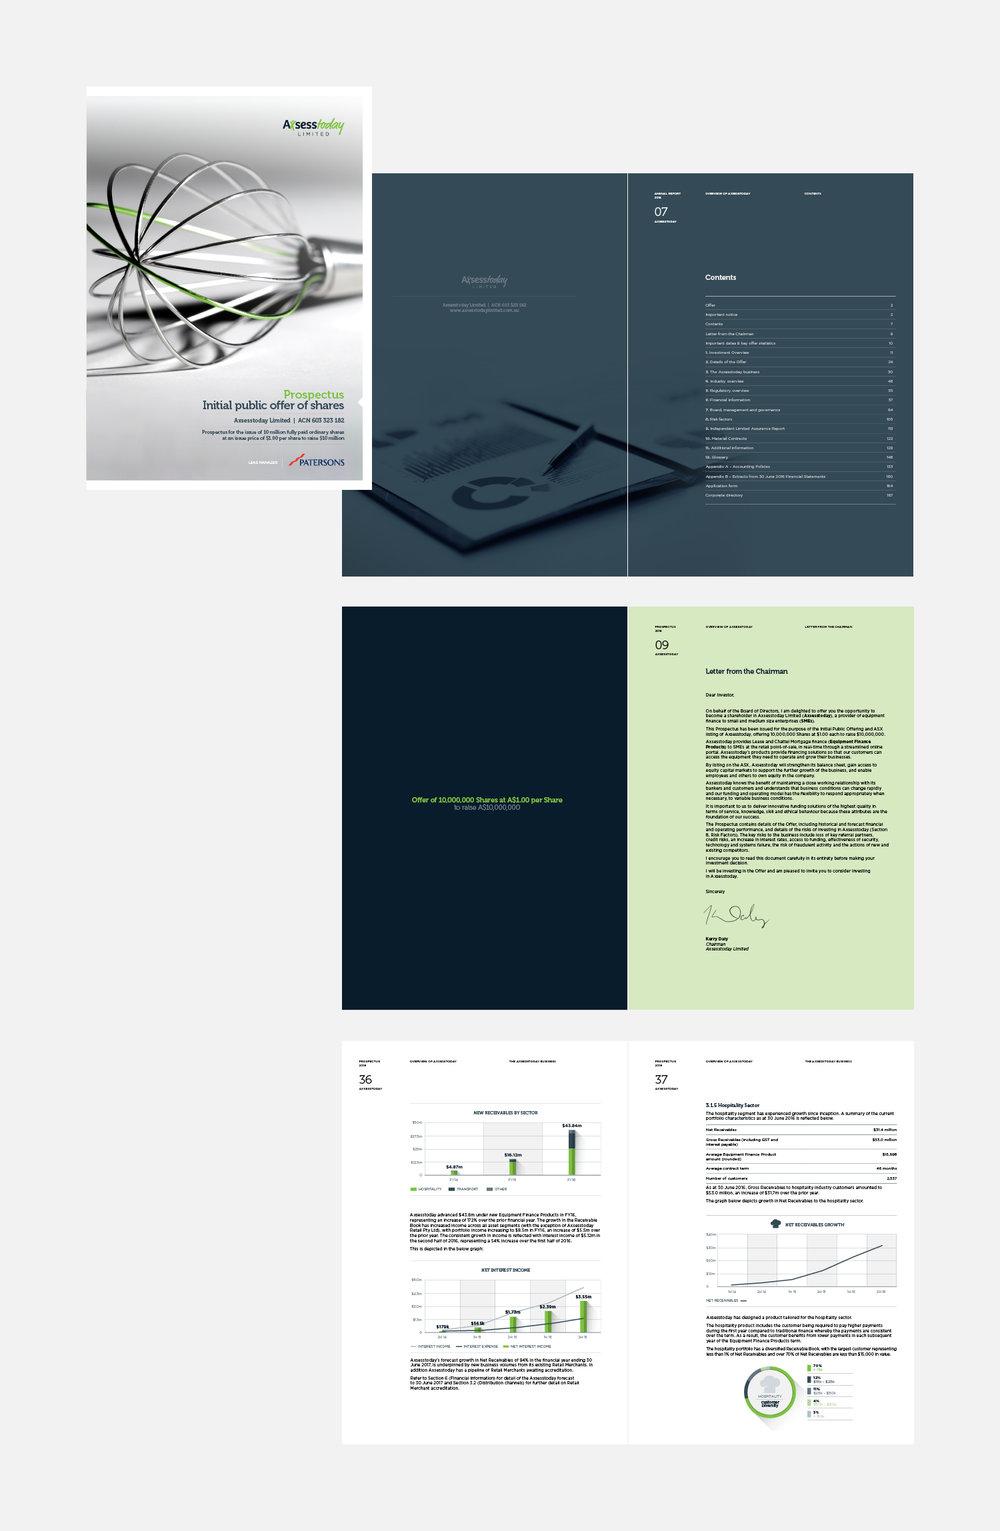 Gray+Design+Axsesstoday+prospectus-1.jpg